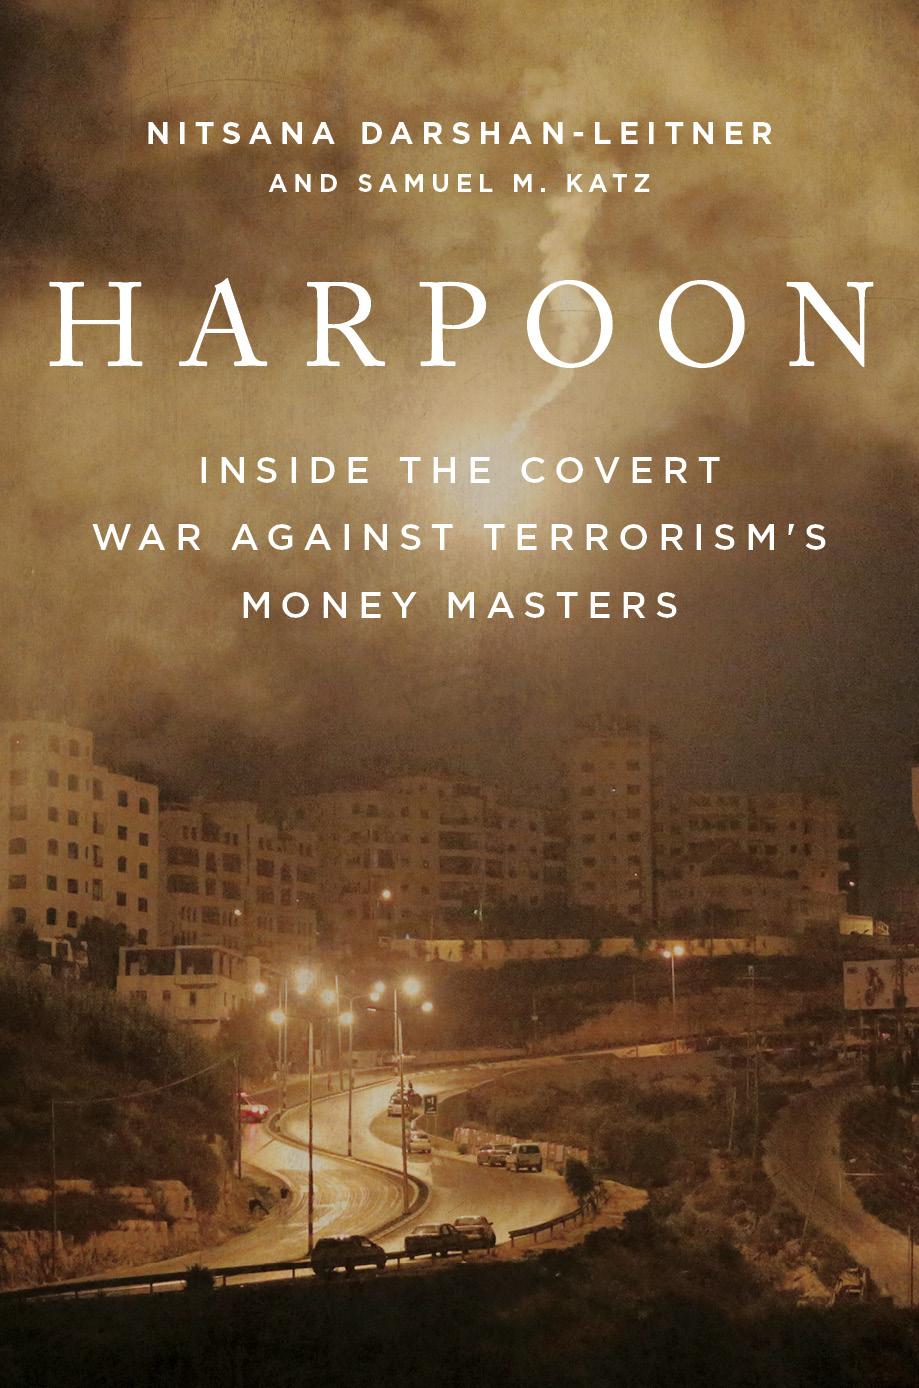 HARPOON Cover.JPG